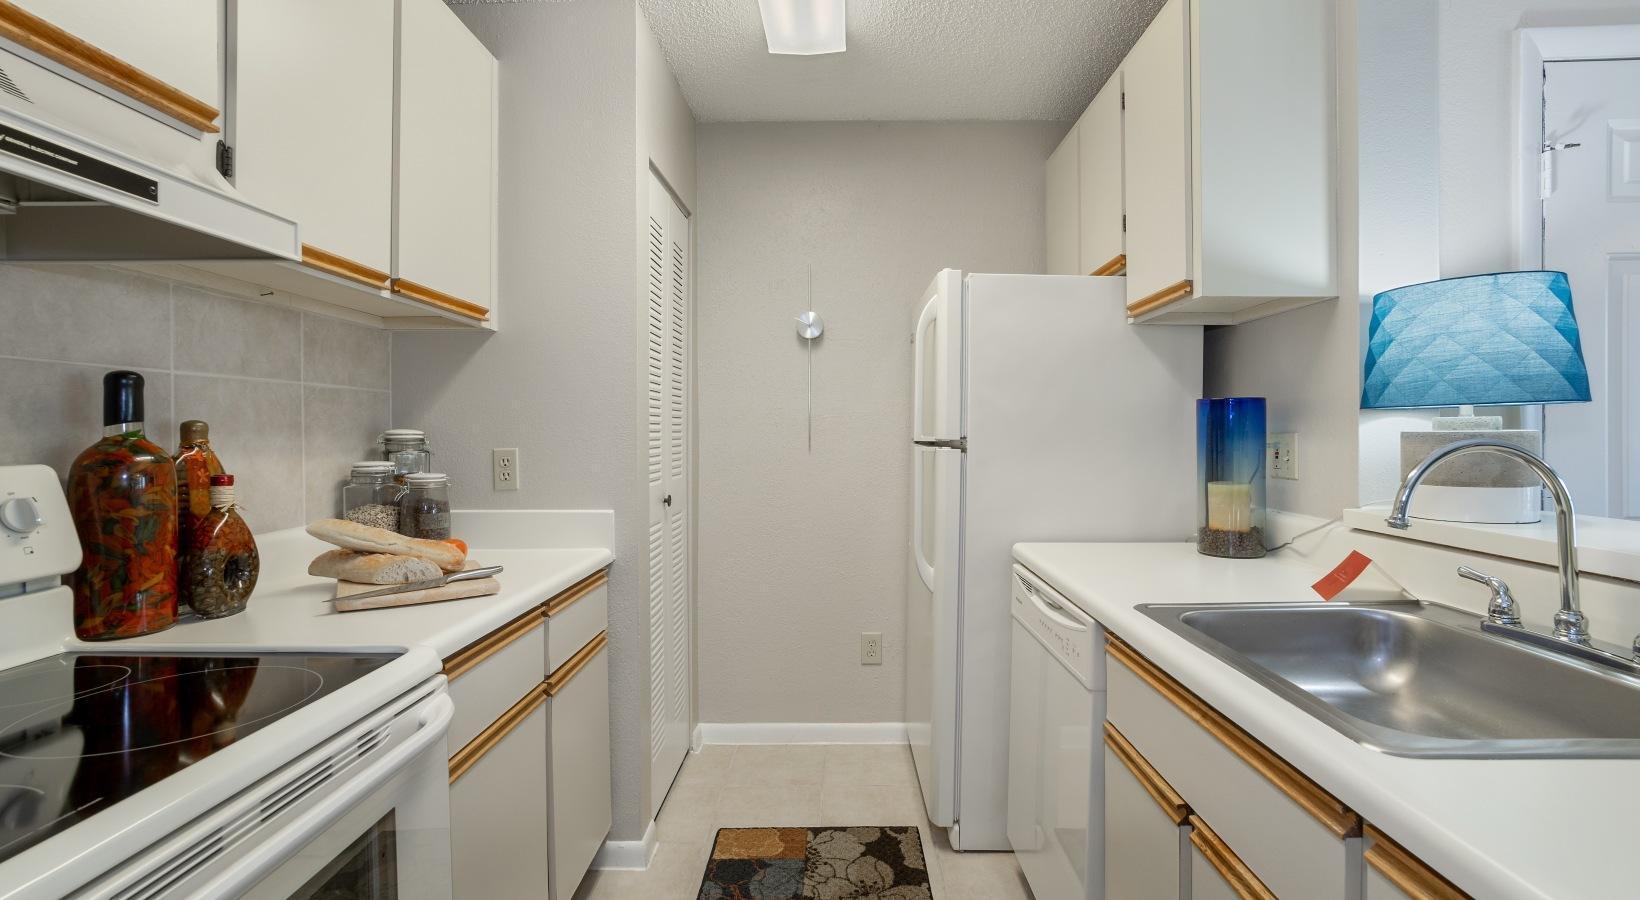 520 Terraceview Cove #19-206, Altamonte Springs, FL - 2,139 USD/ month